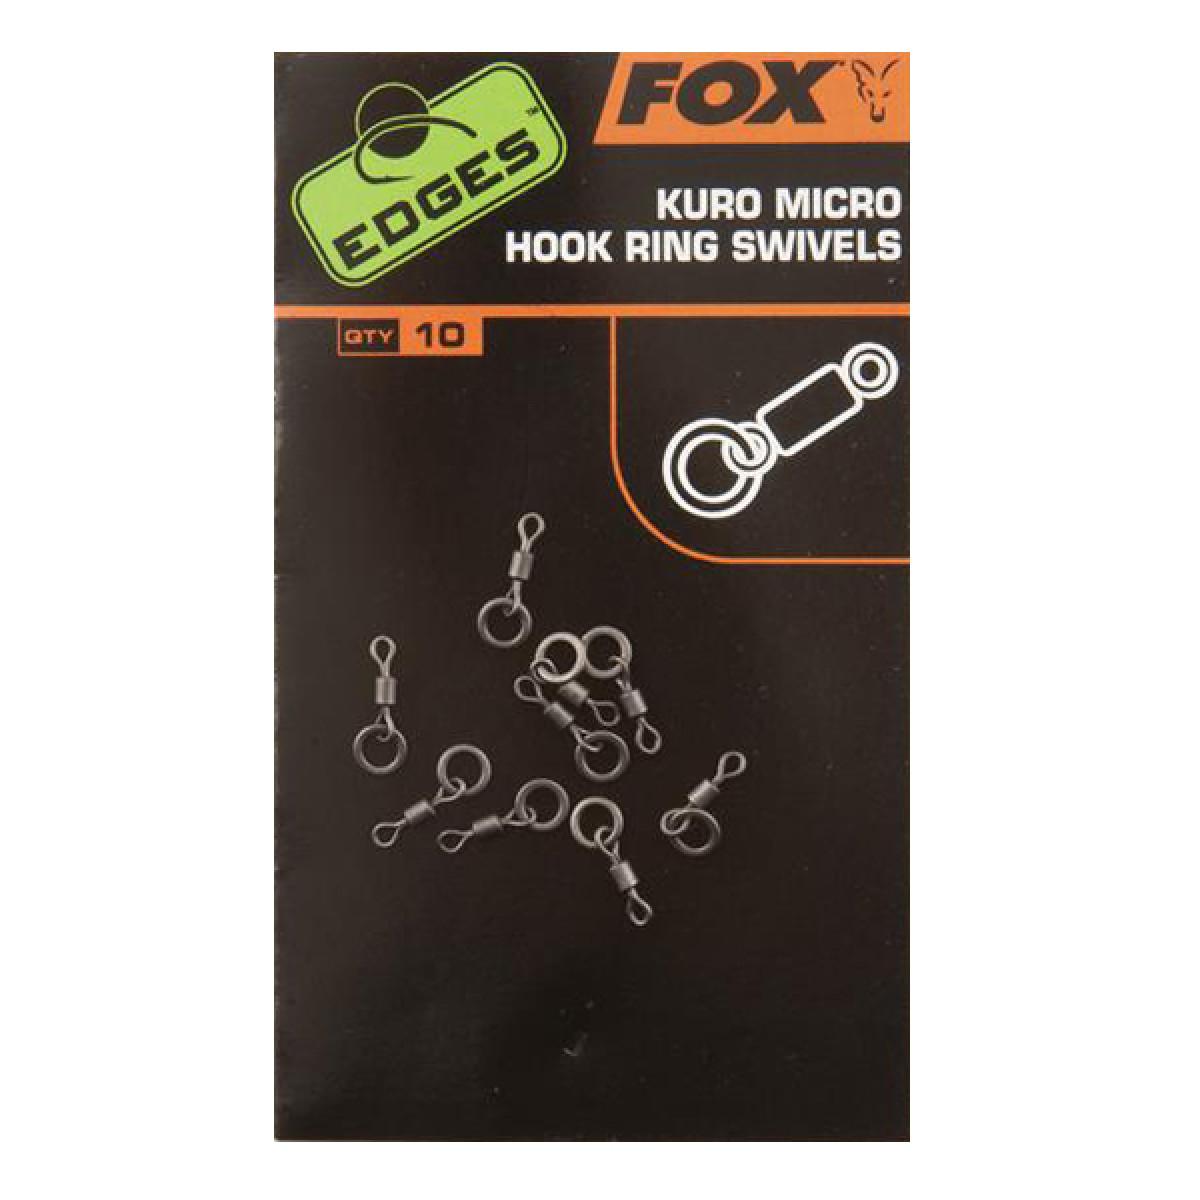 Kuro Micro Hook Ring Swivel